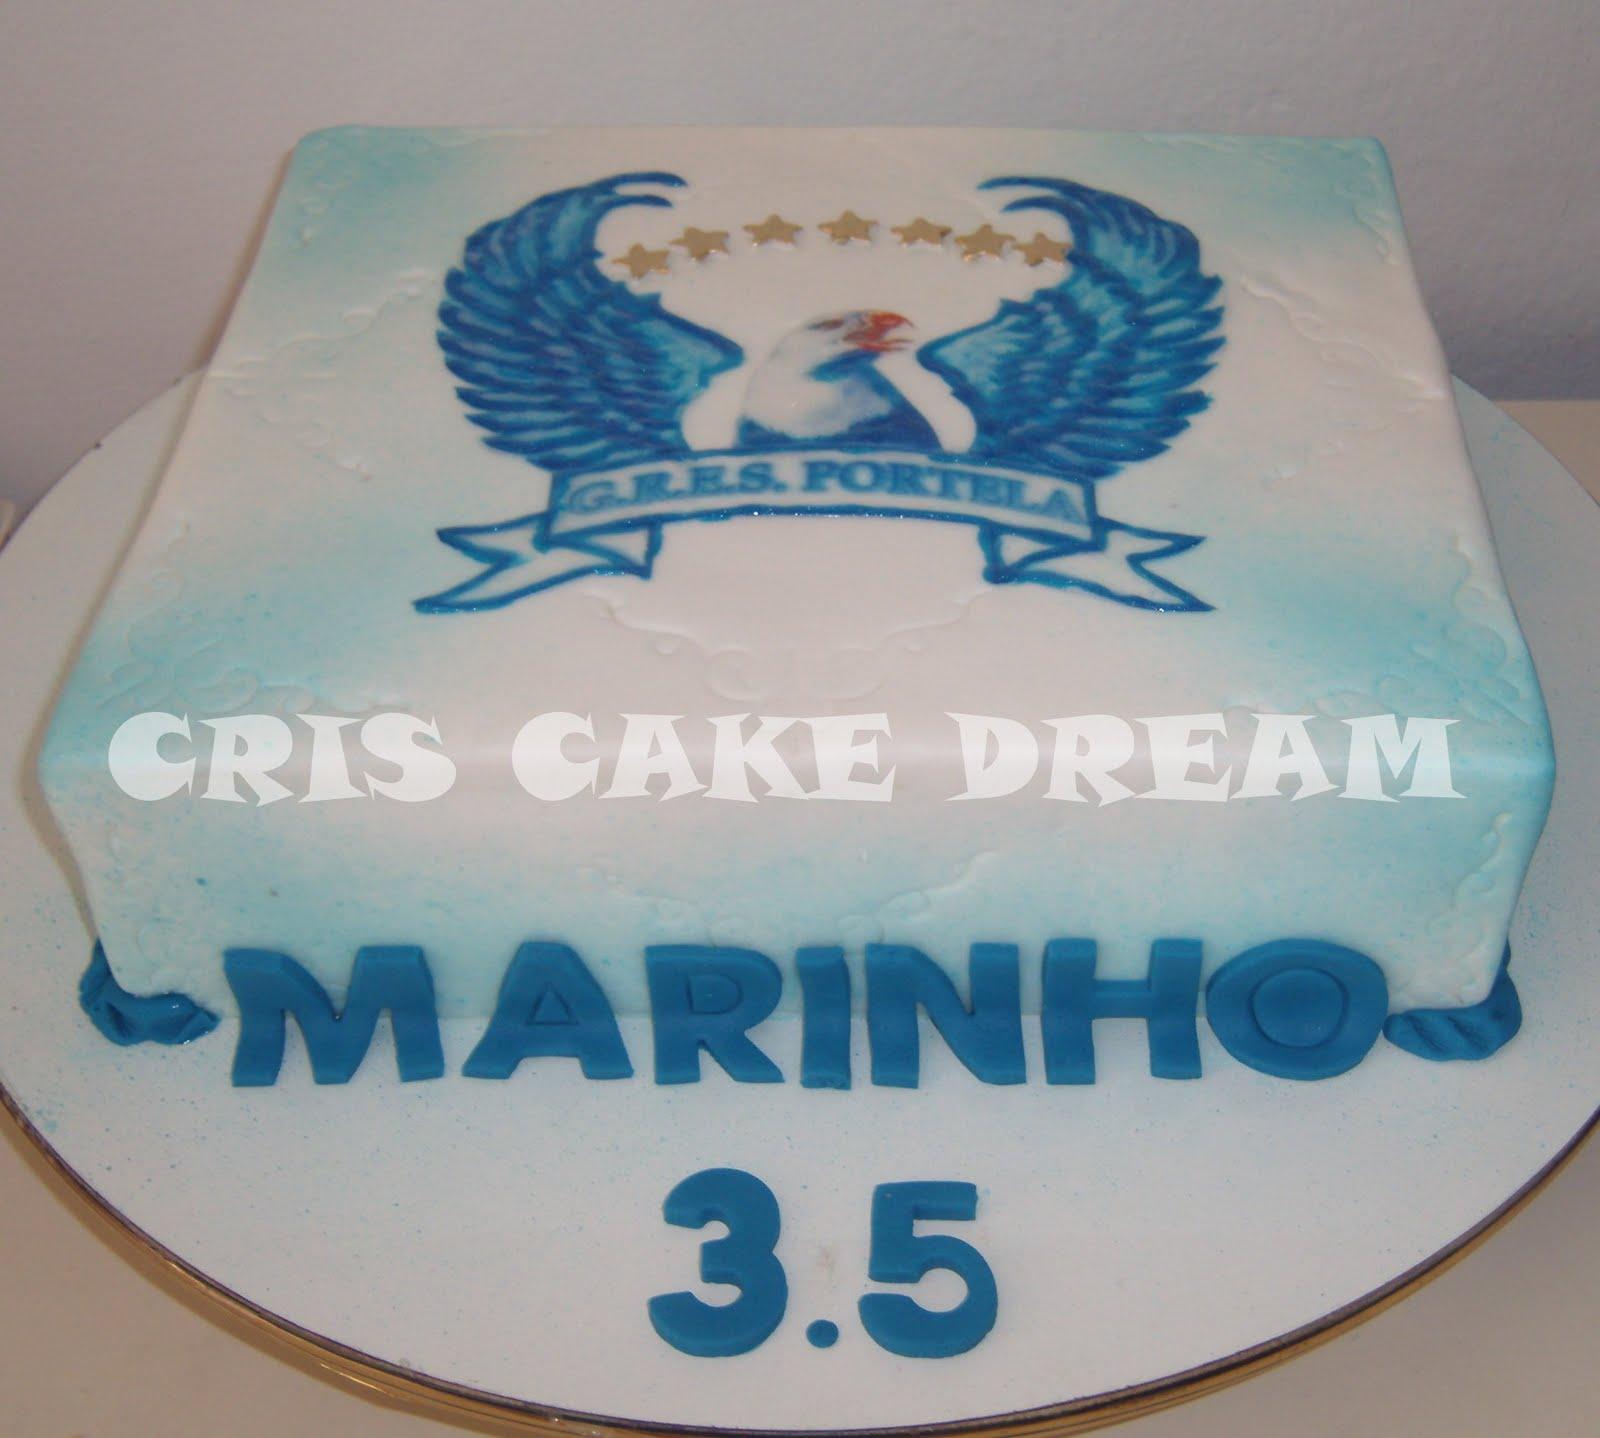 Palhares Cake